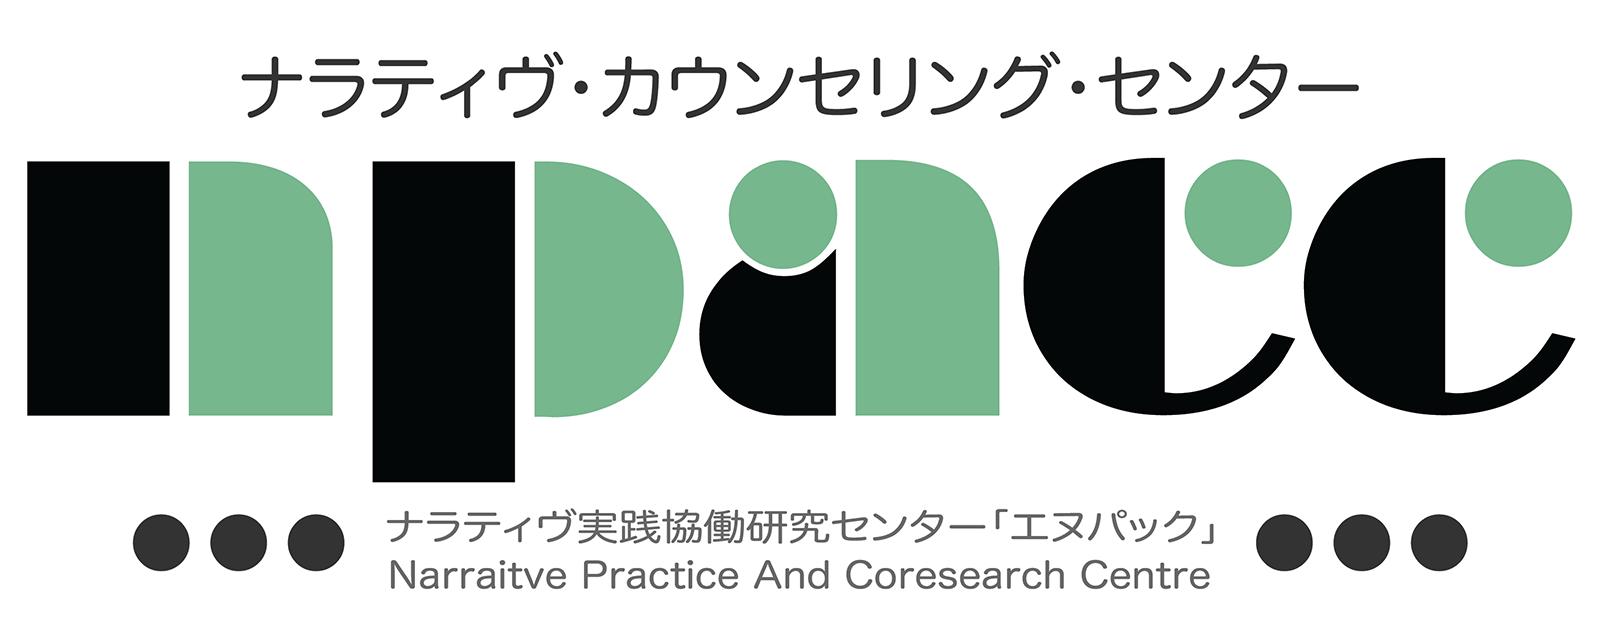 NPACC Logo001-1